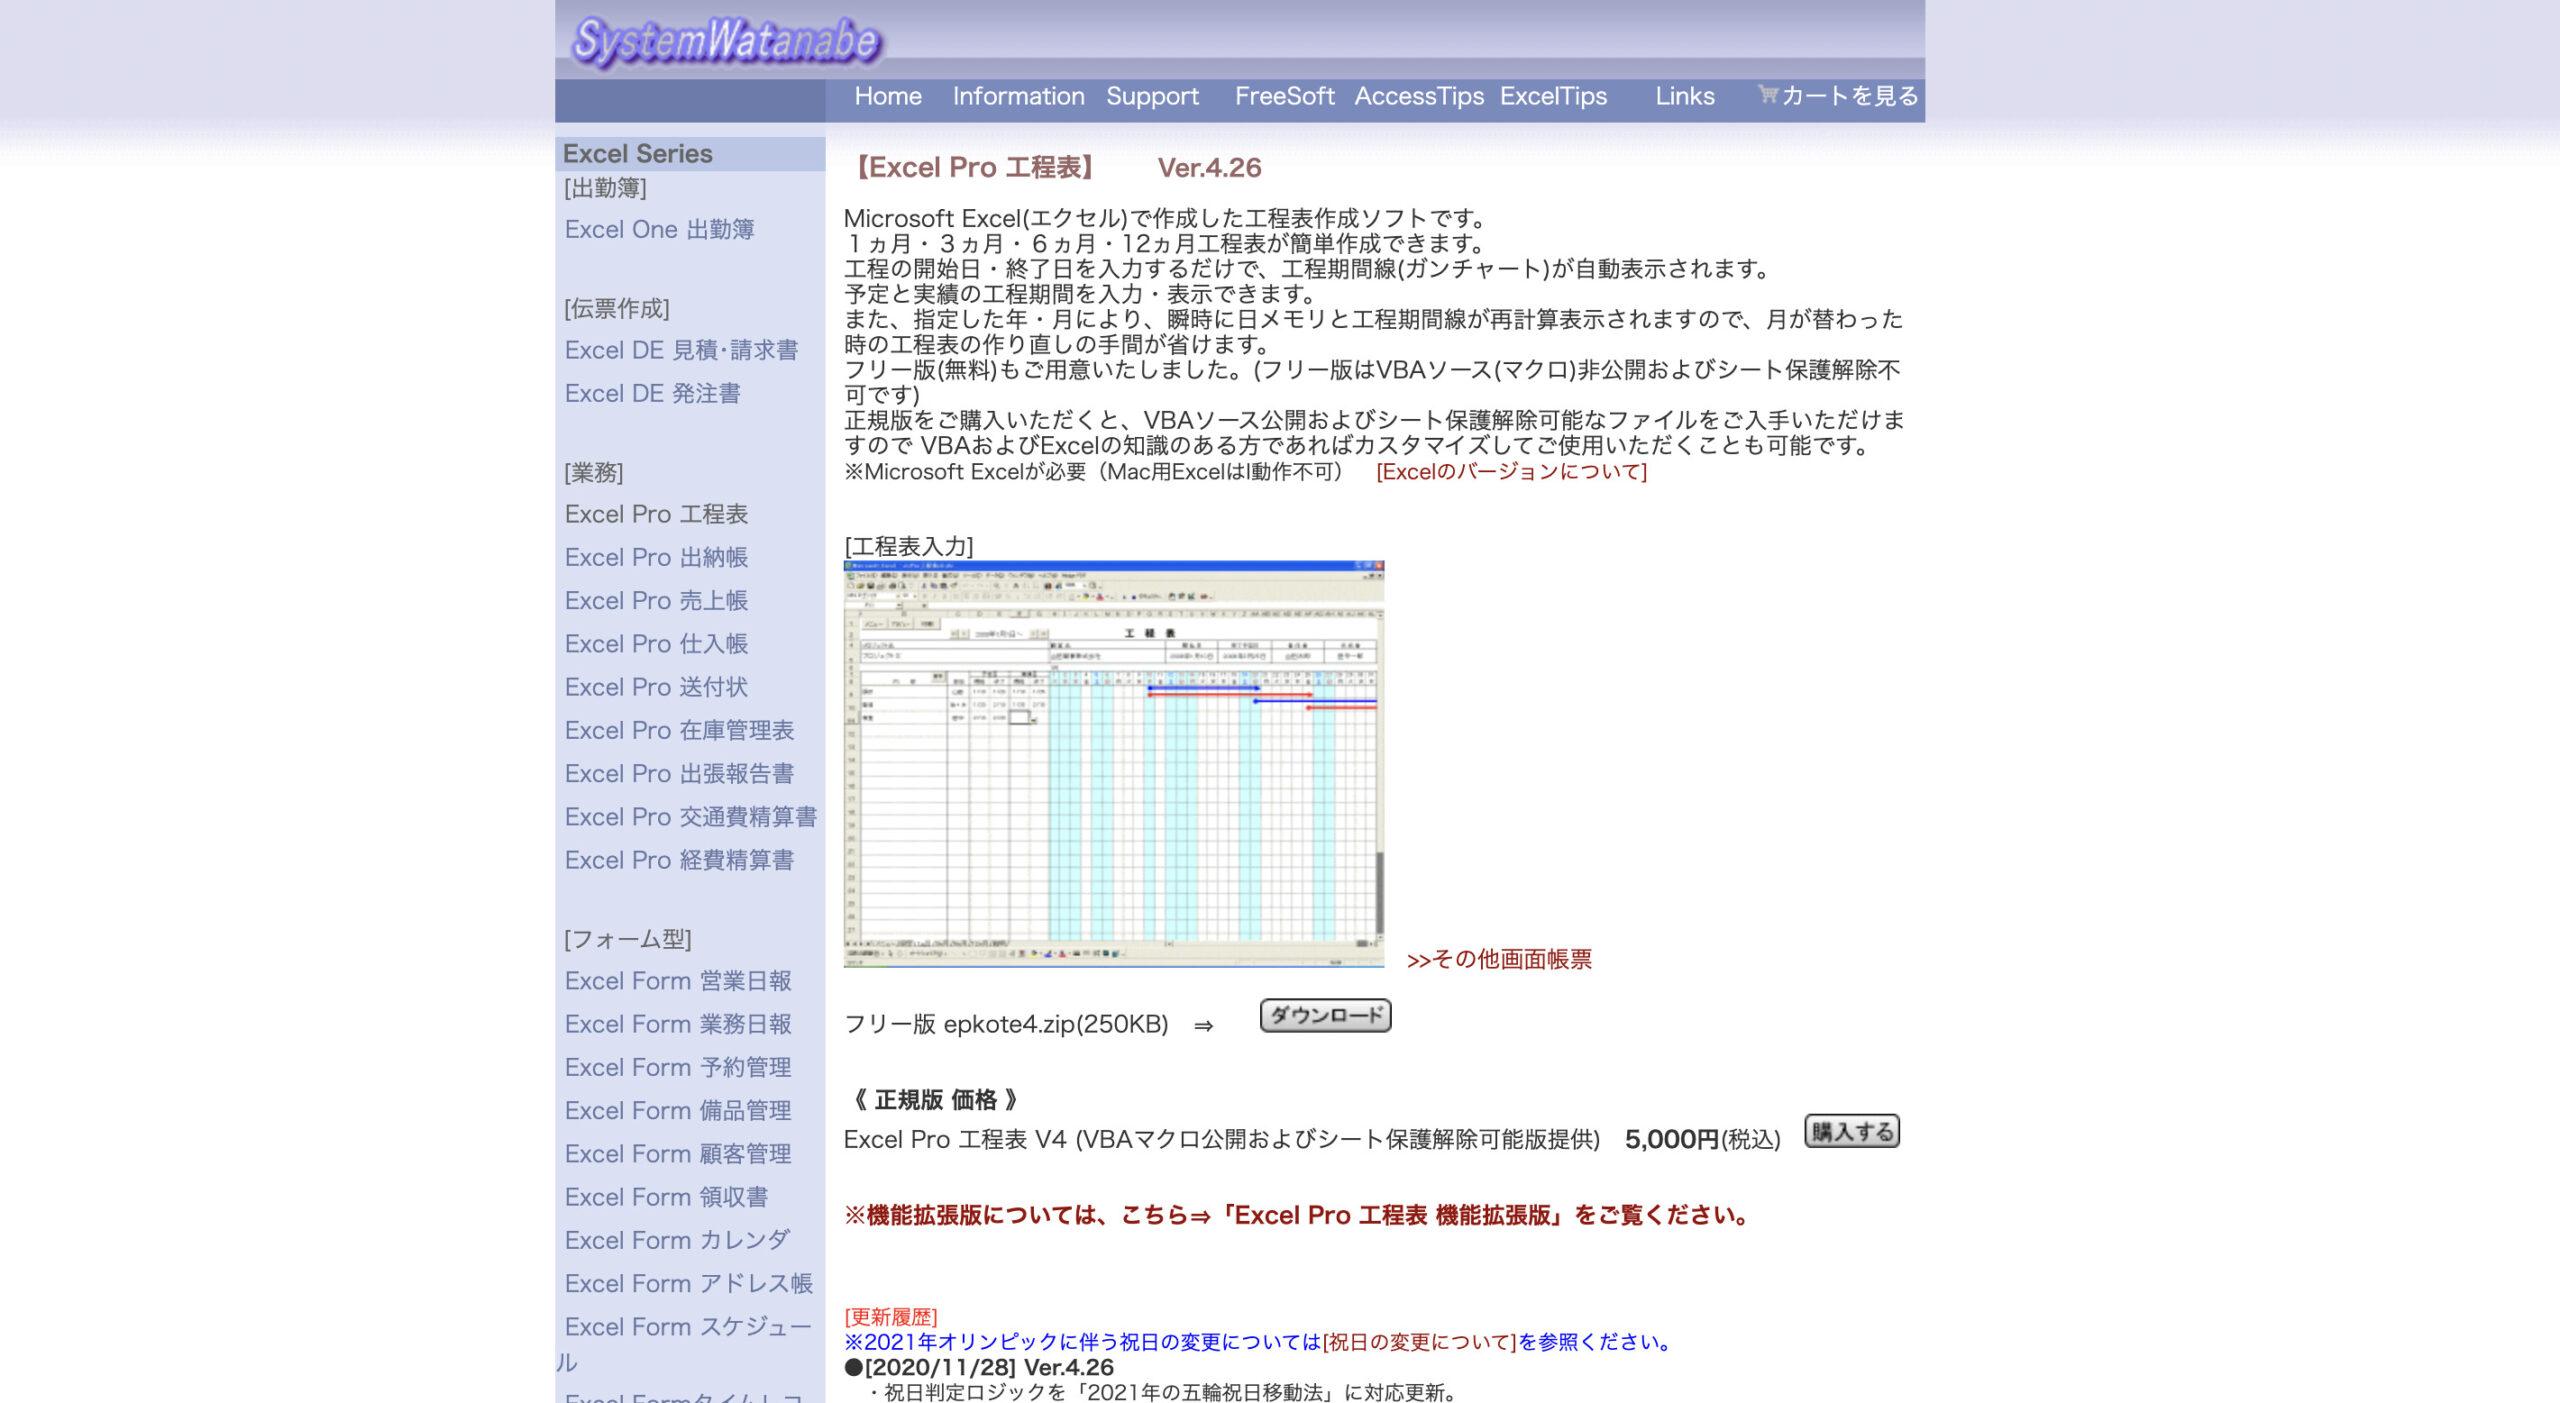 Excel Pro 工程表